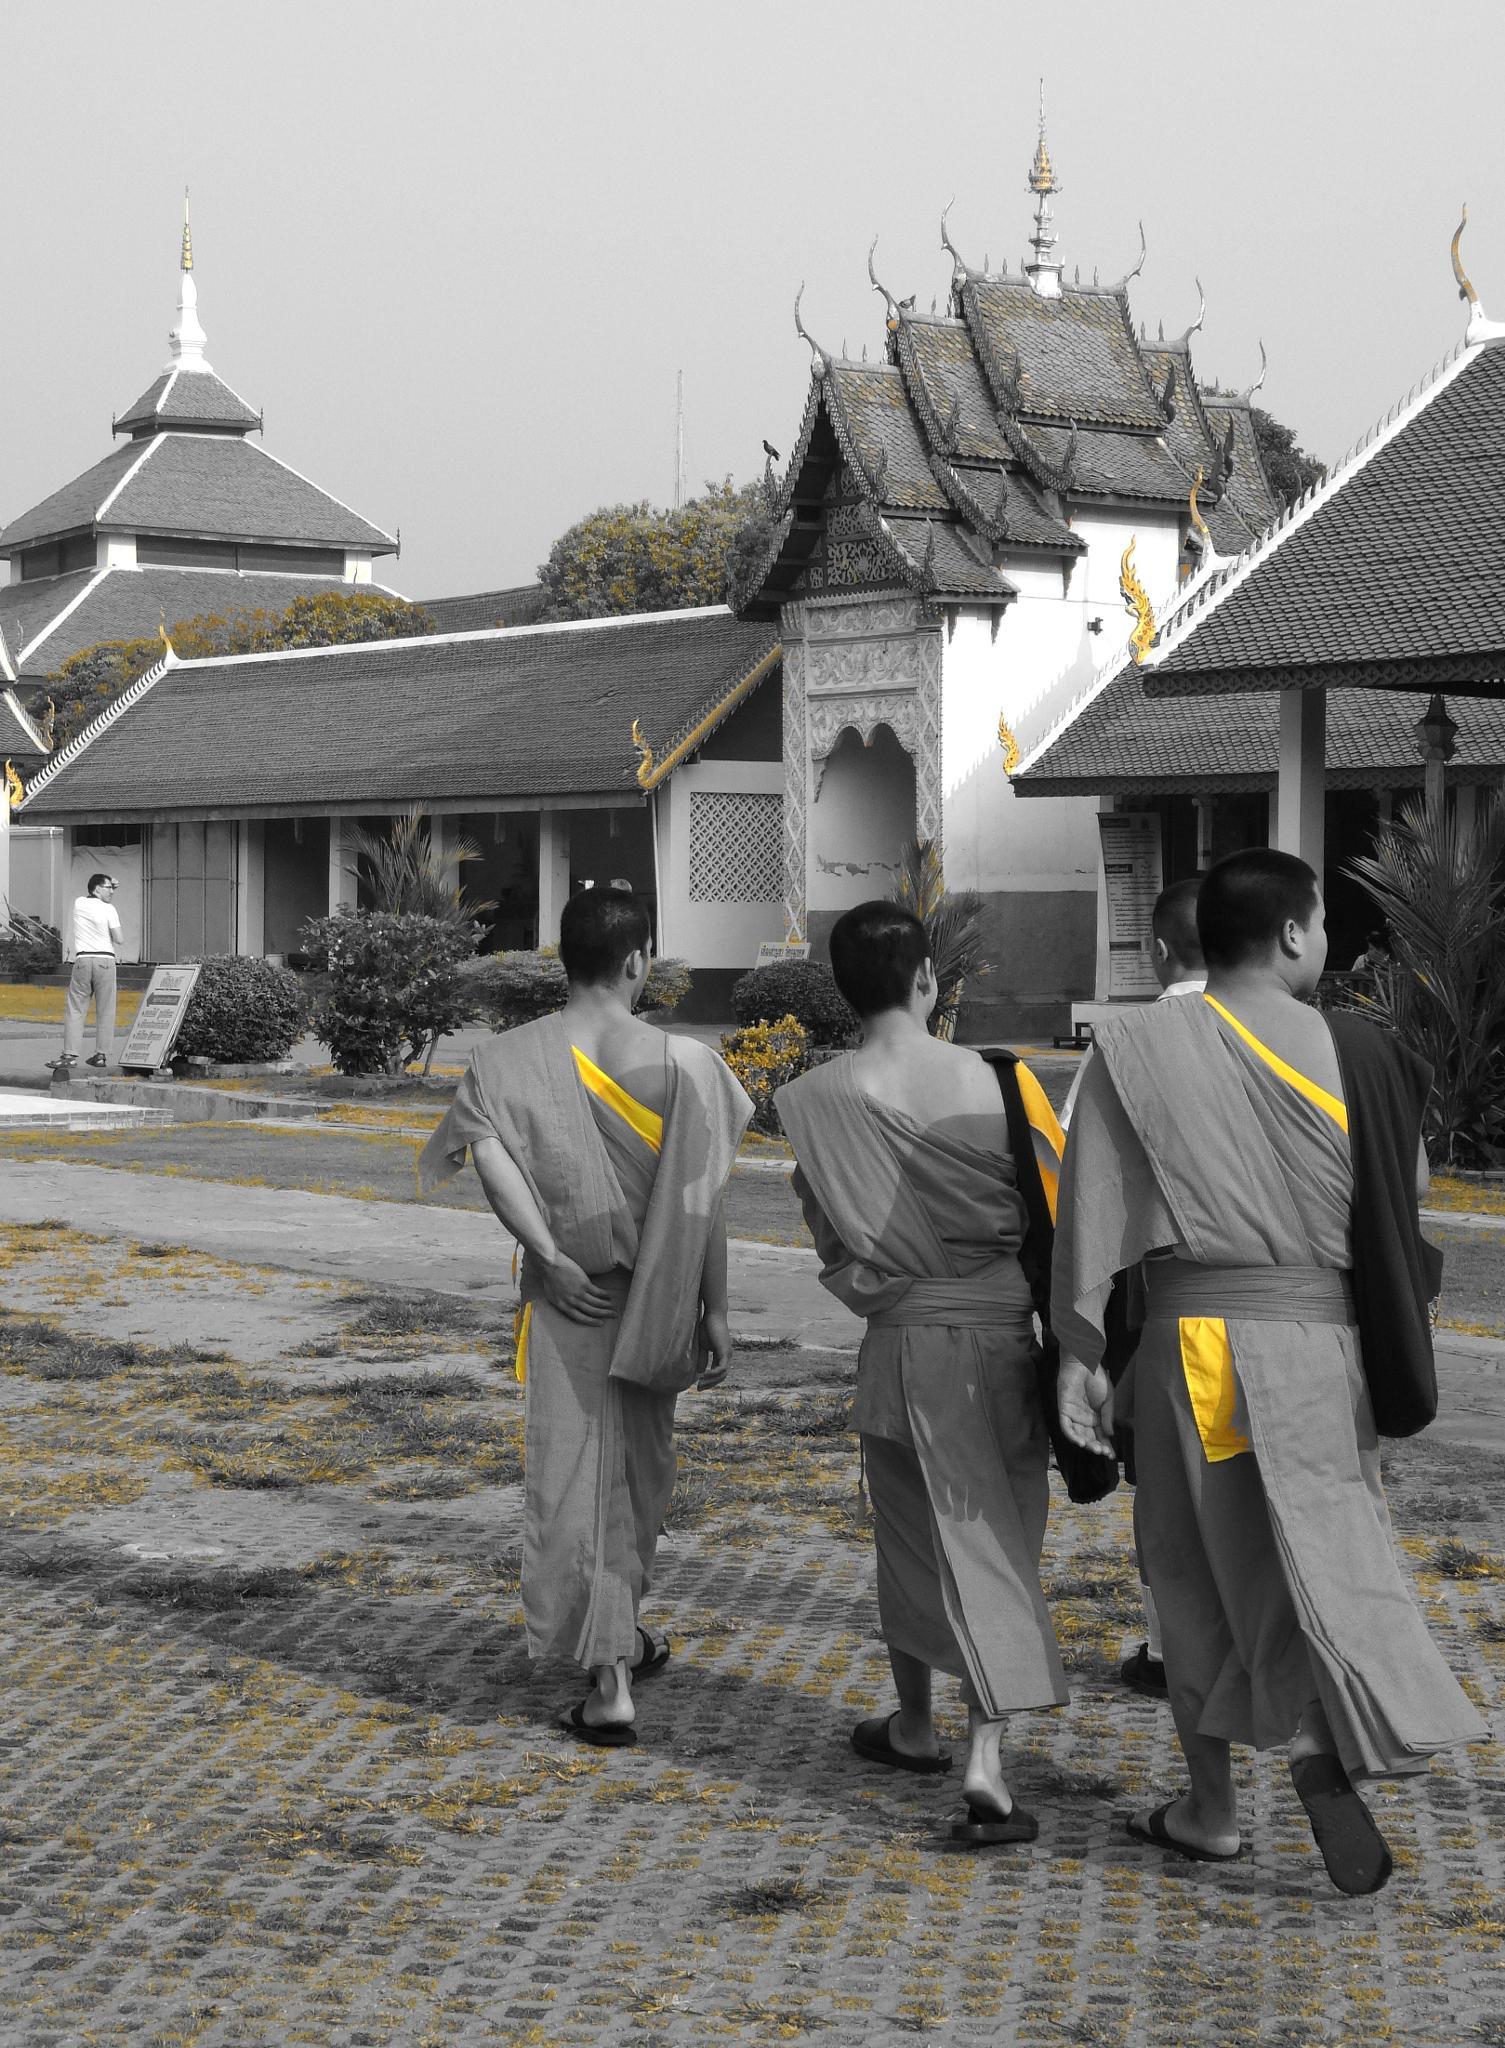 Thaïlande: le Temple de Lampang (Wat Phra That Lampang Luang). 2/? by Daniel Van der Beken - Iribarren